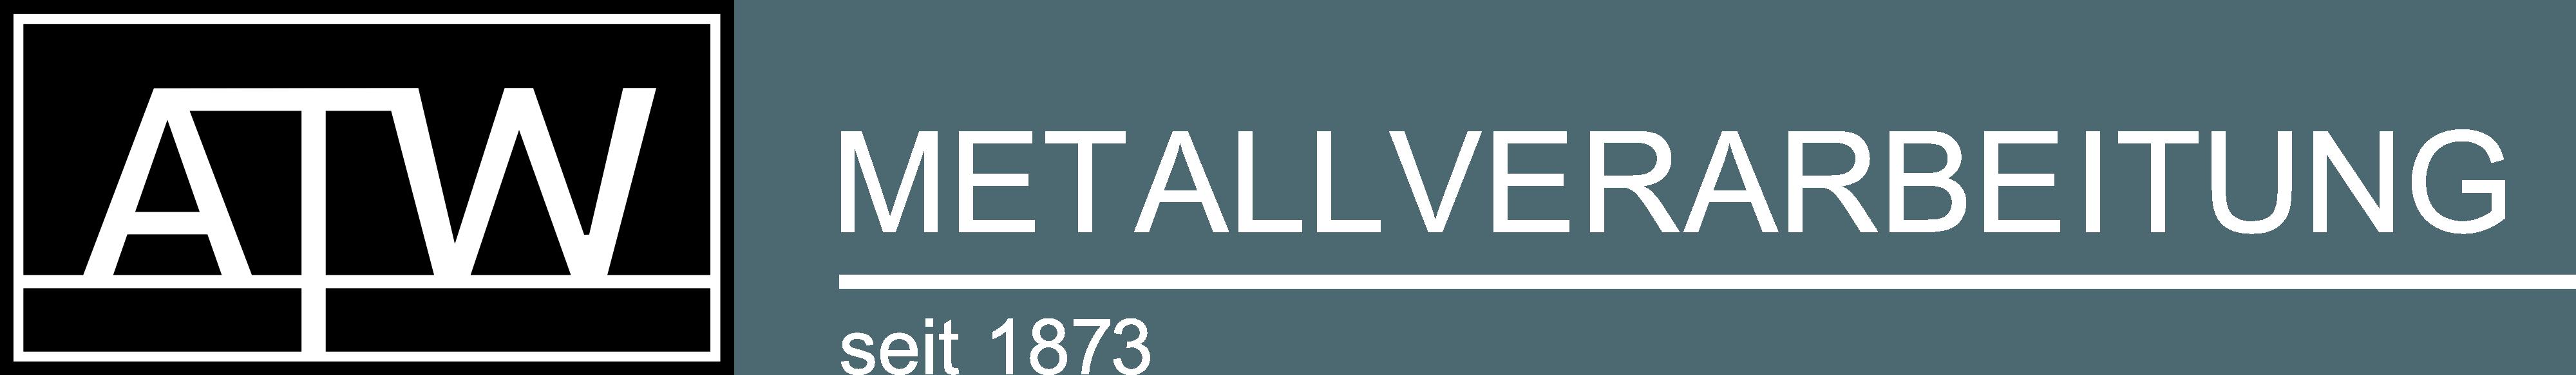 ATW Metallverarbeitung Logo